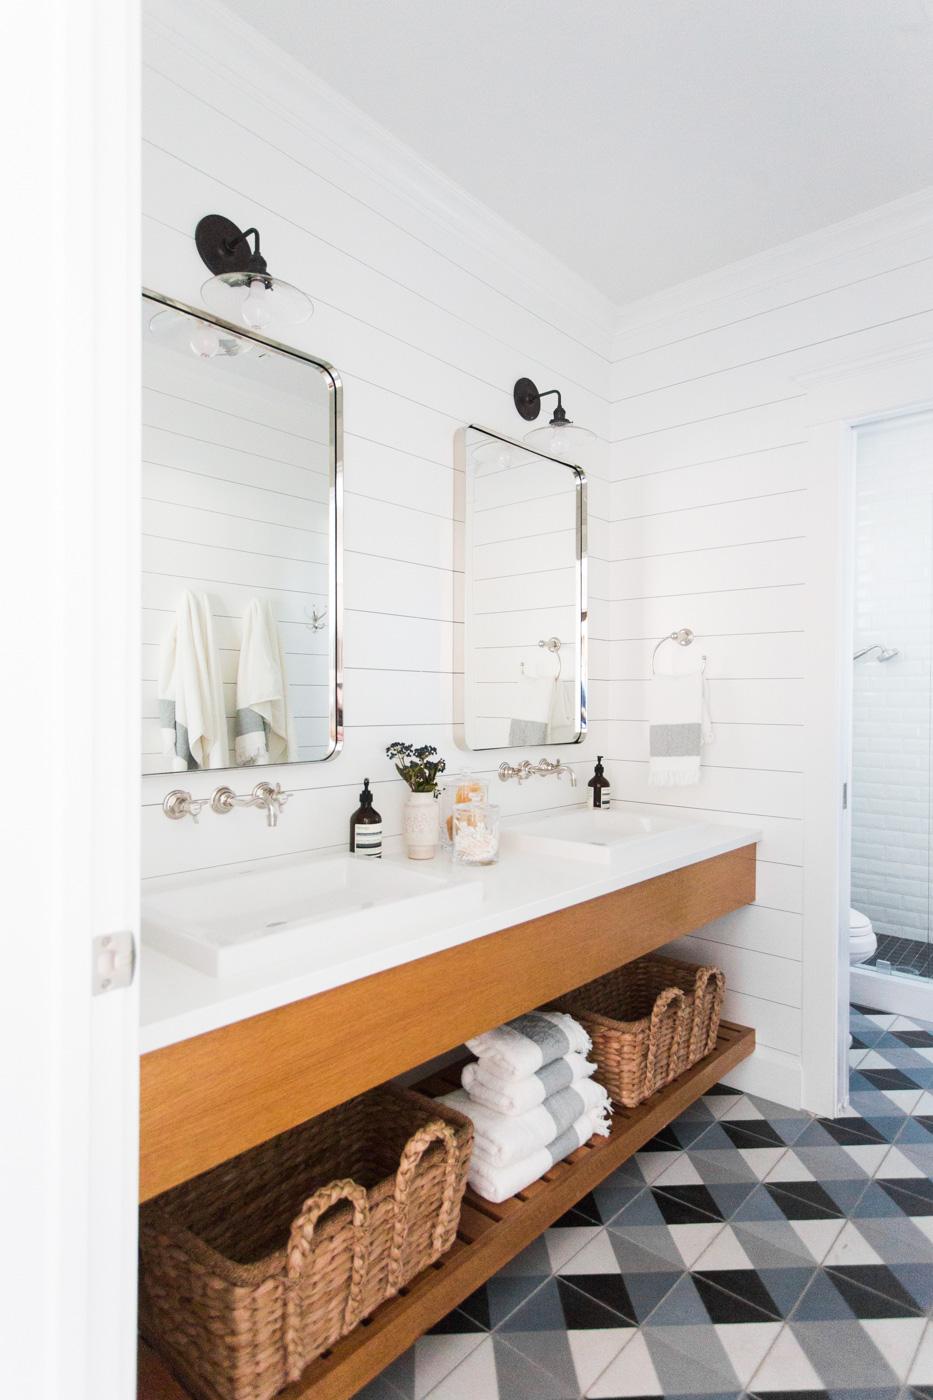 Tiled bathroom floor beneath vanity